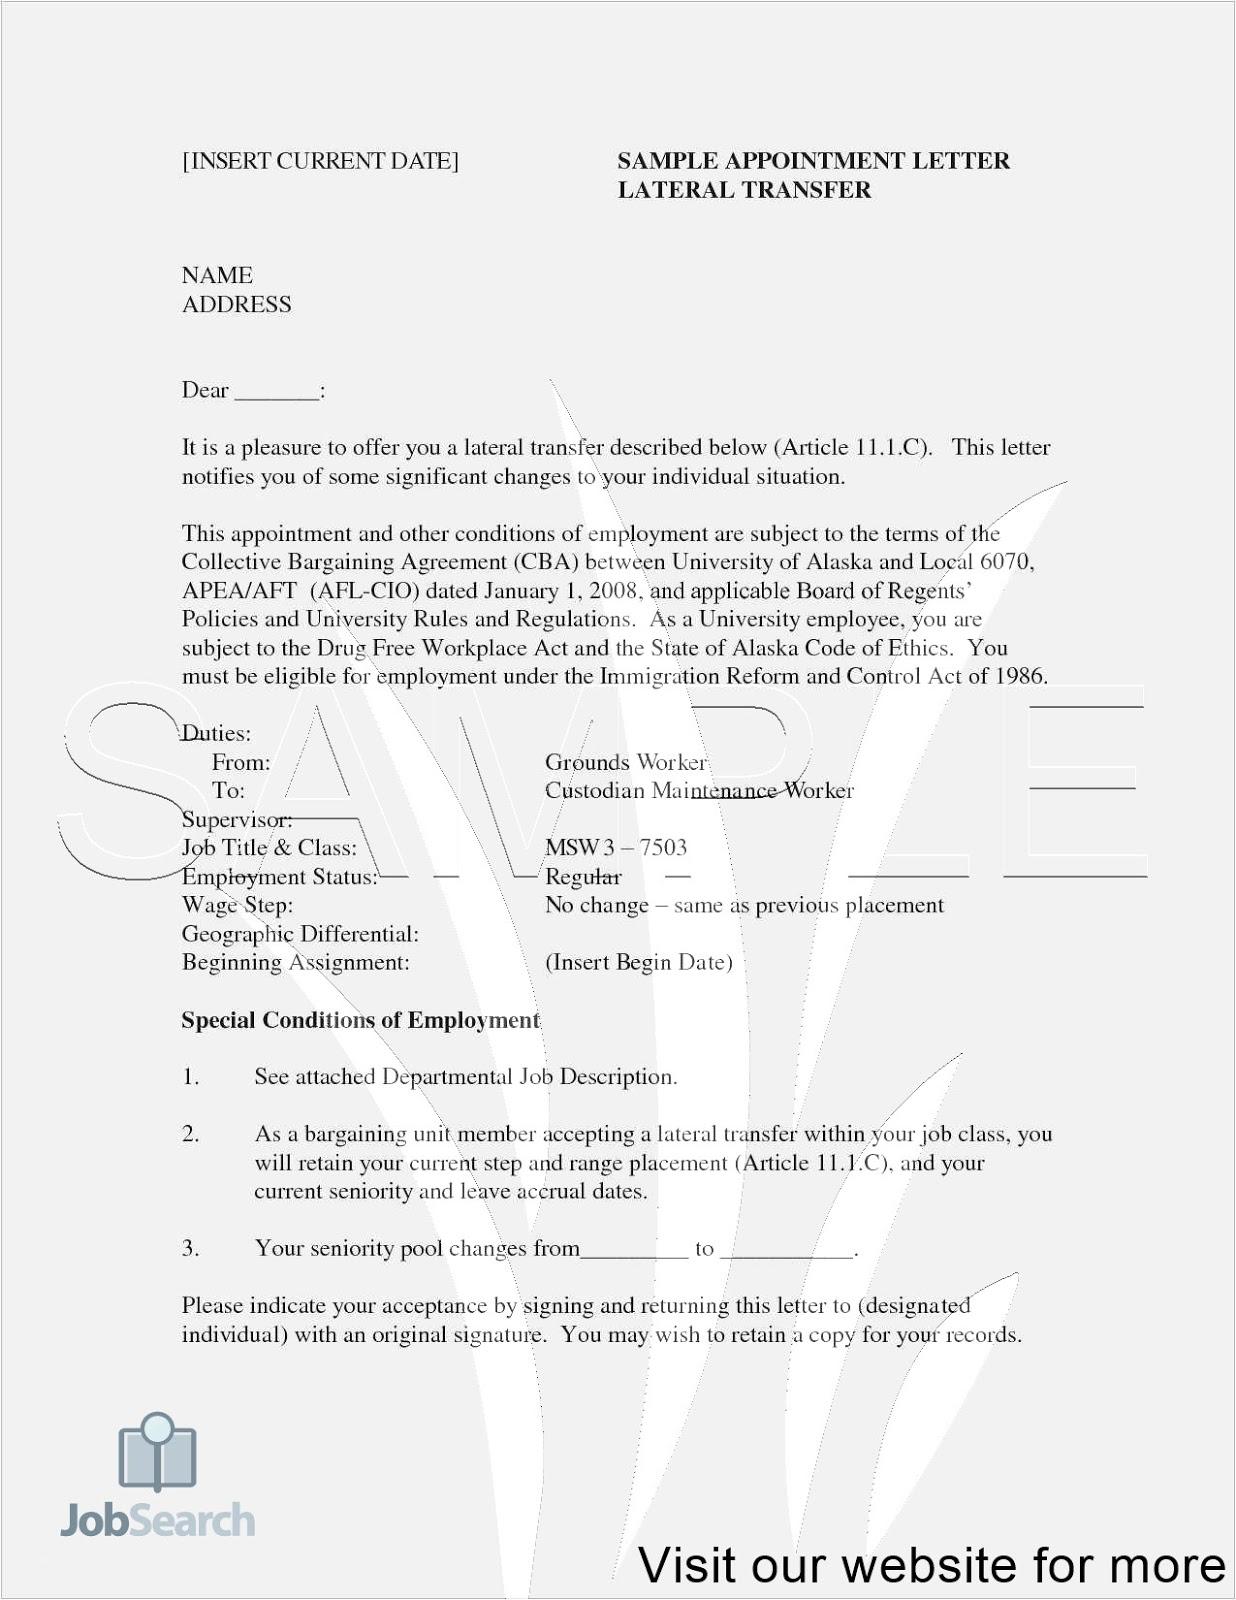 Interior Design Resume Samples 2020 Usa Australia Interior Design Resume Templates Resume Templates